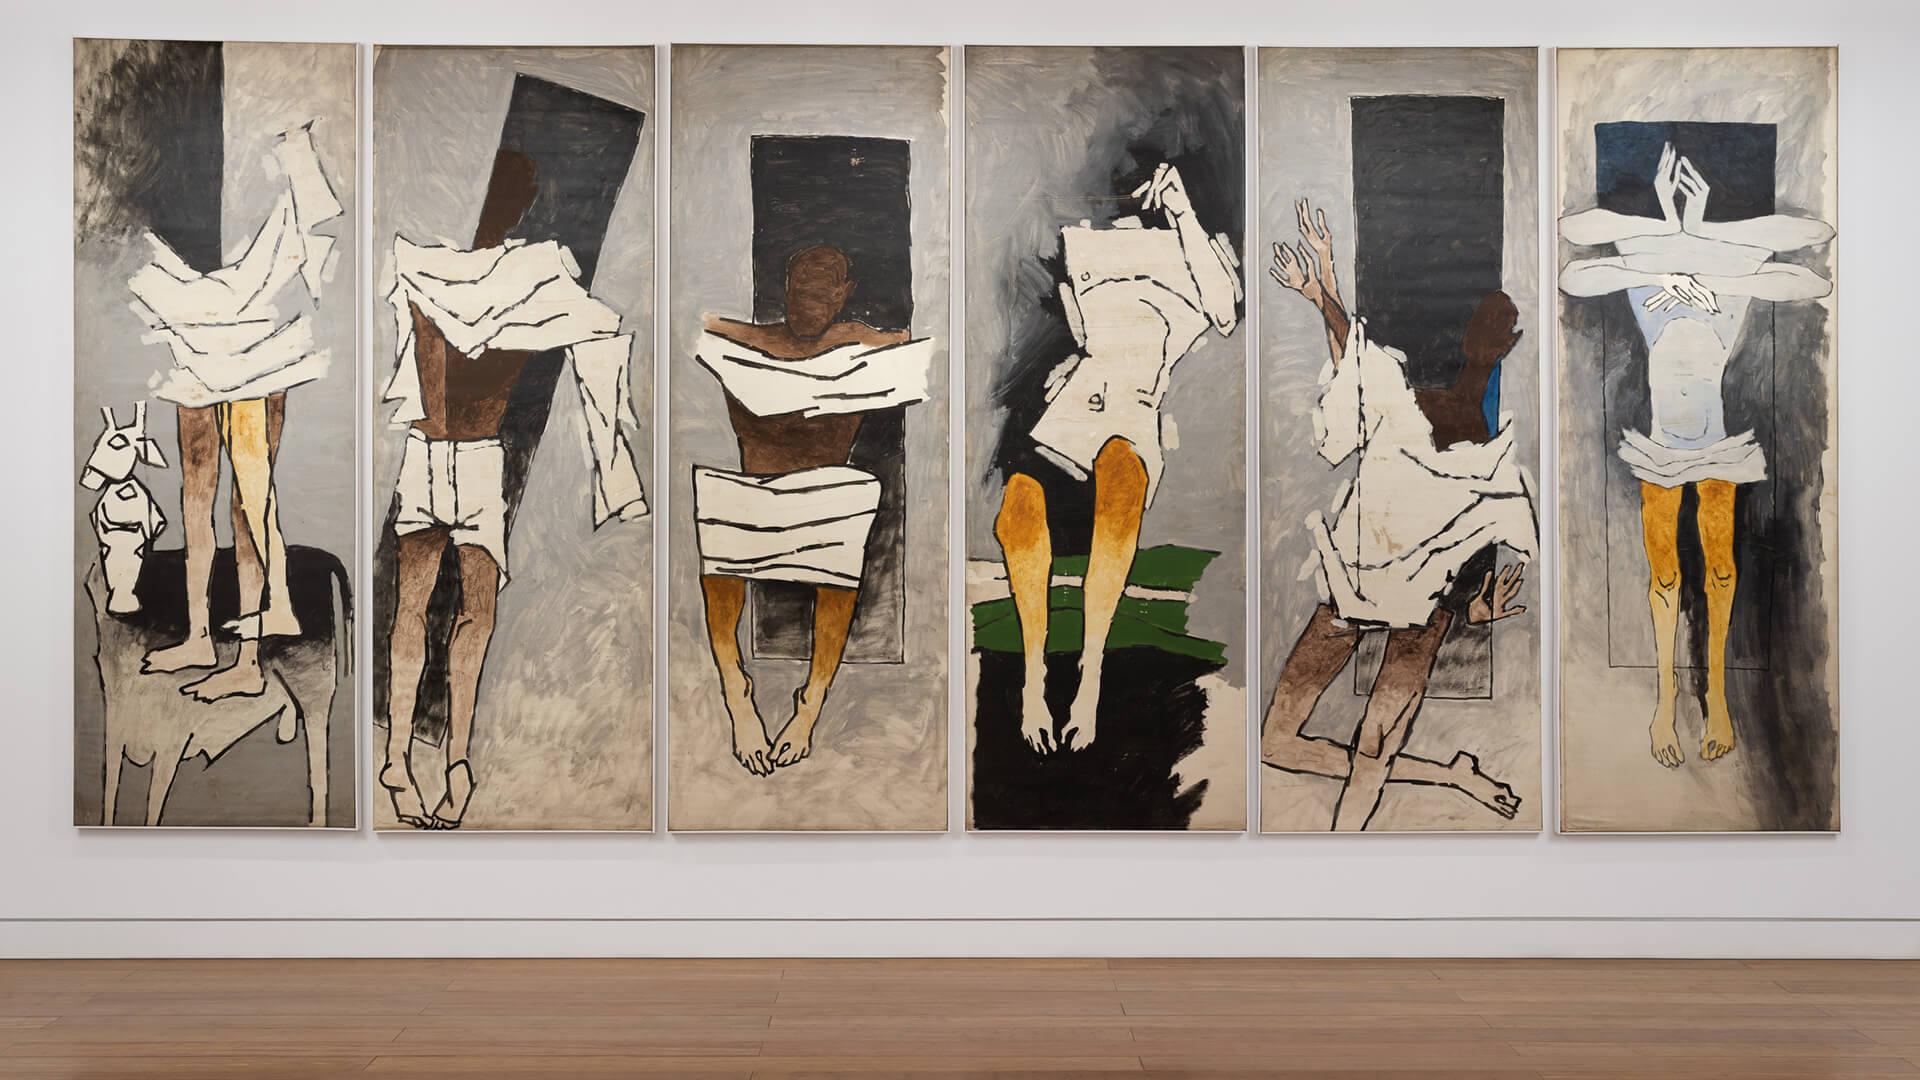 Gallery view of The Attenborough Panels | Maqbool Fida Husain | The Attenborough Panels | MF Husain's death anniversary | Aicon Contemporary | STIRworld